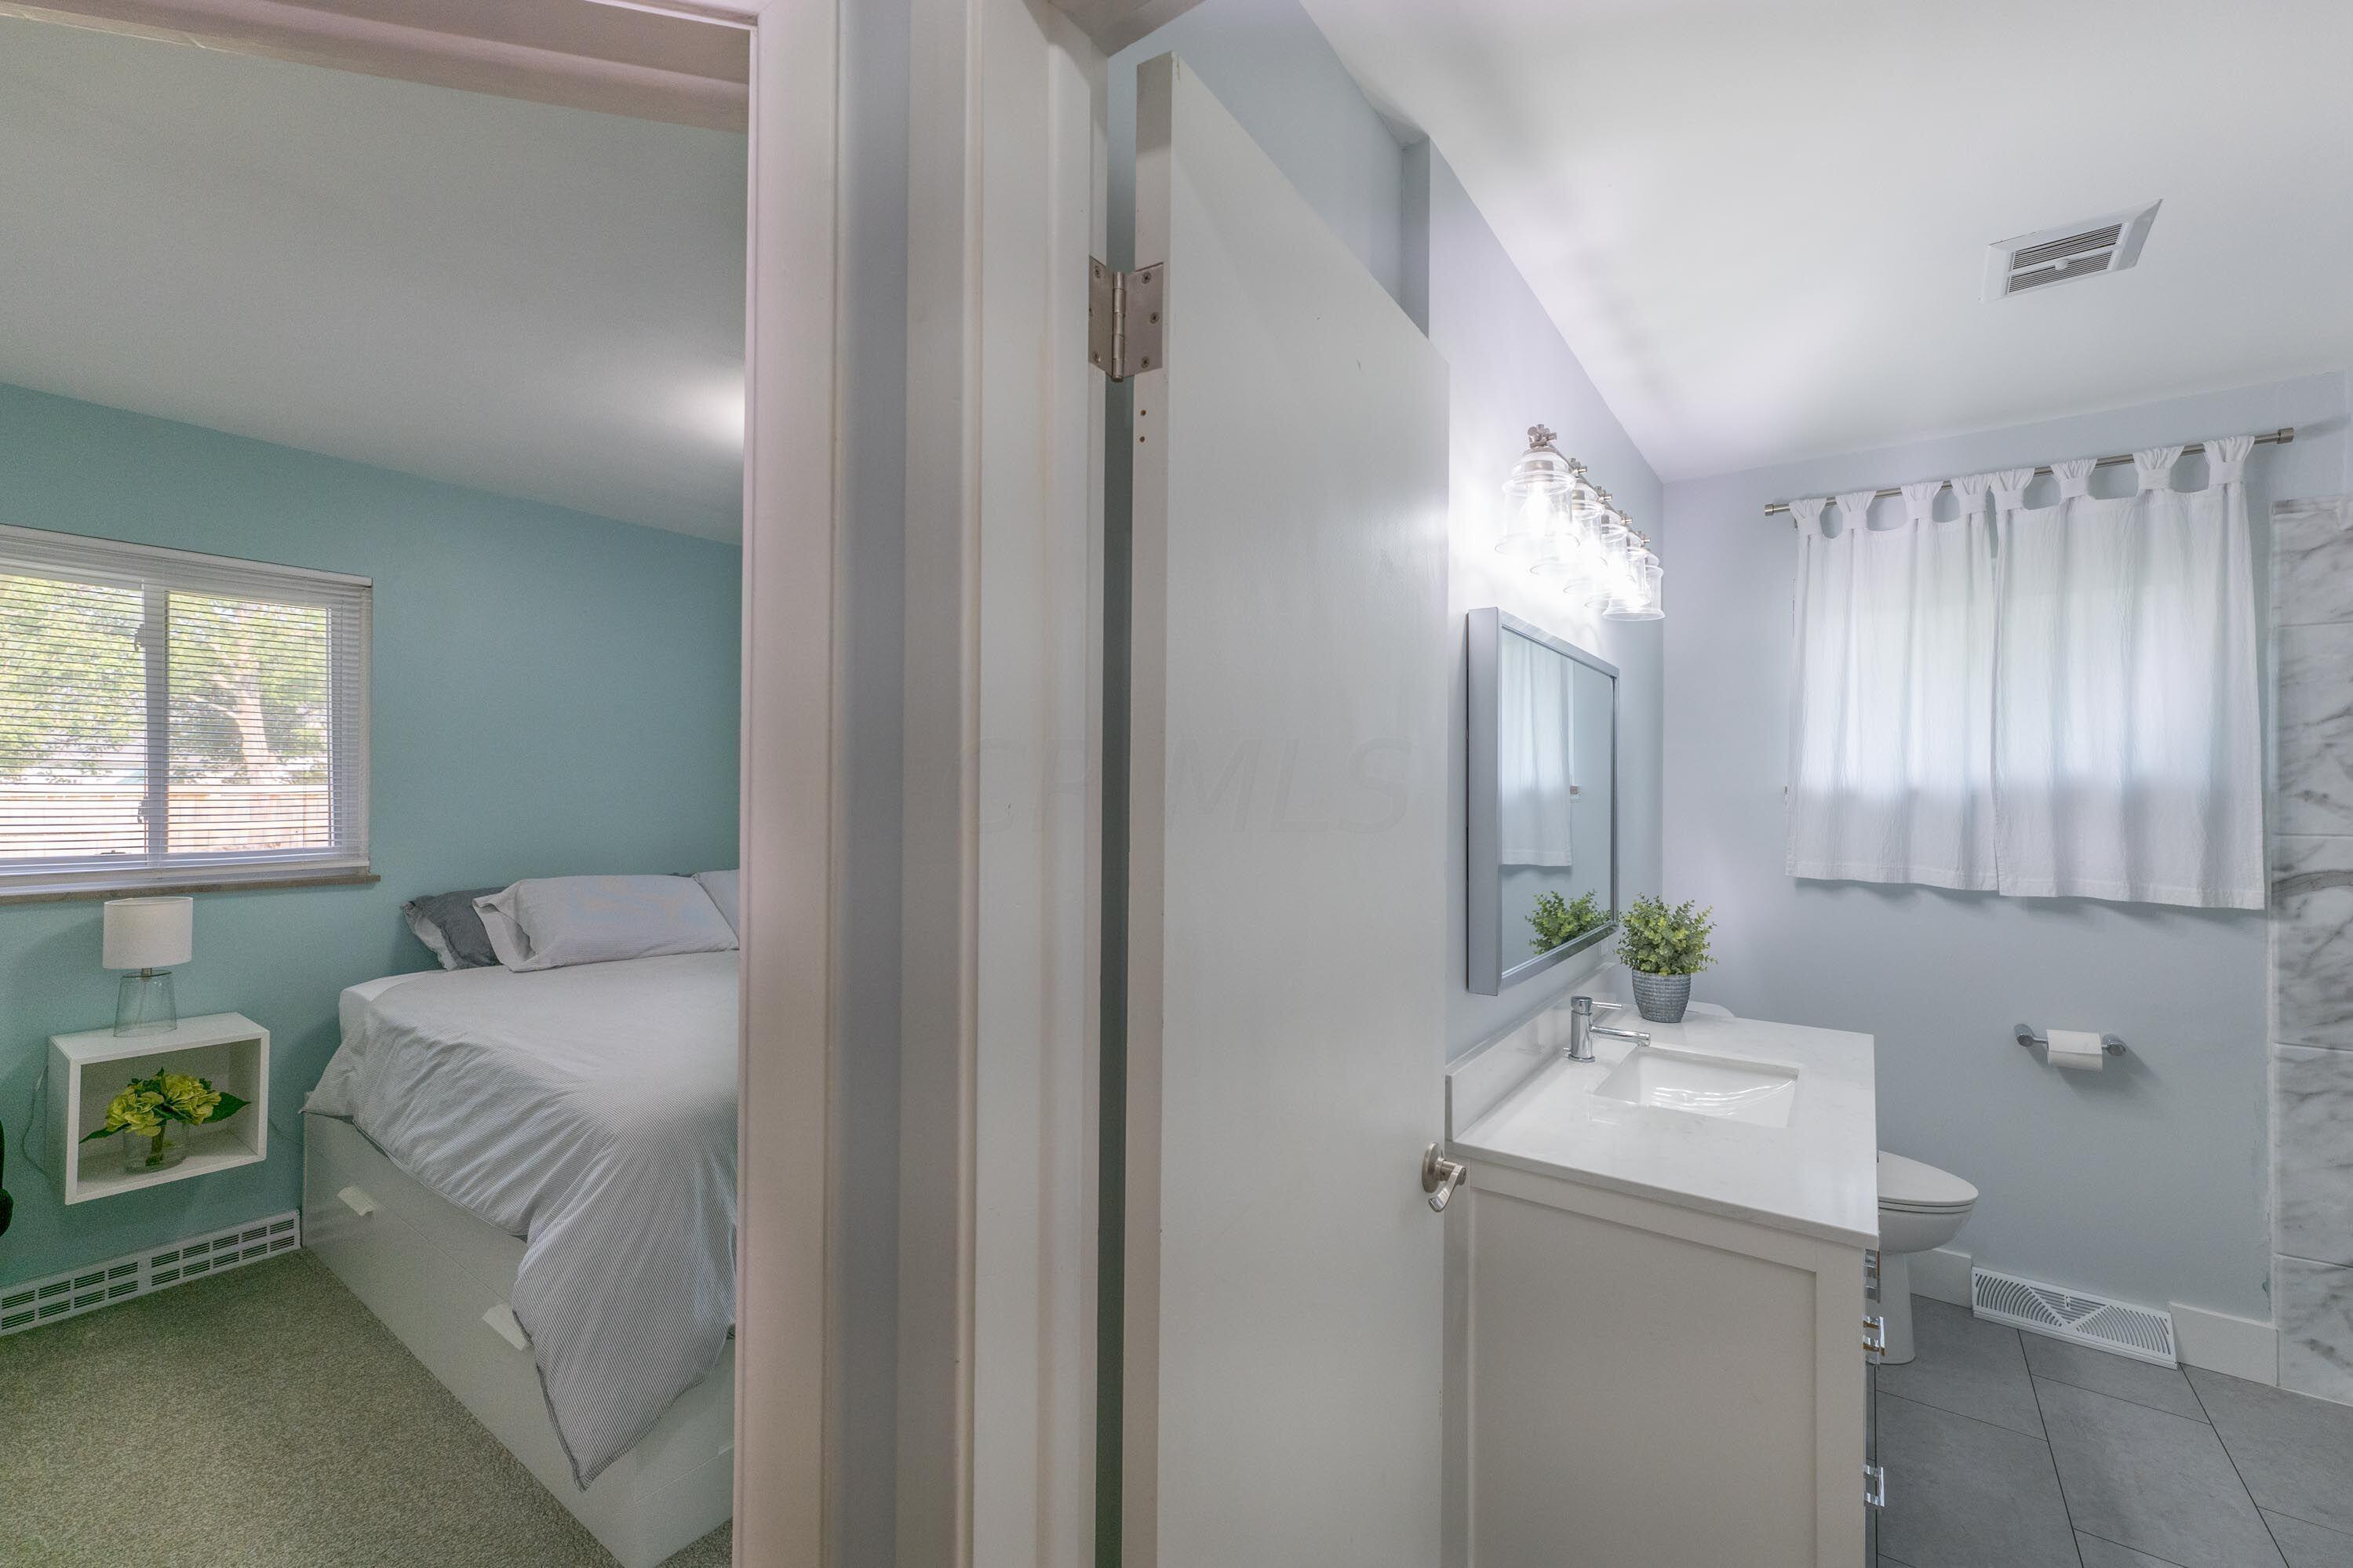 Hall bath next to owner's bedroom